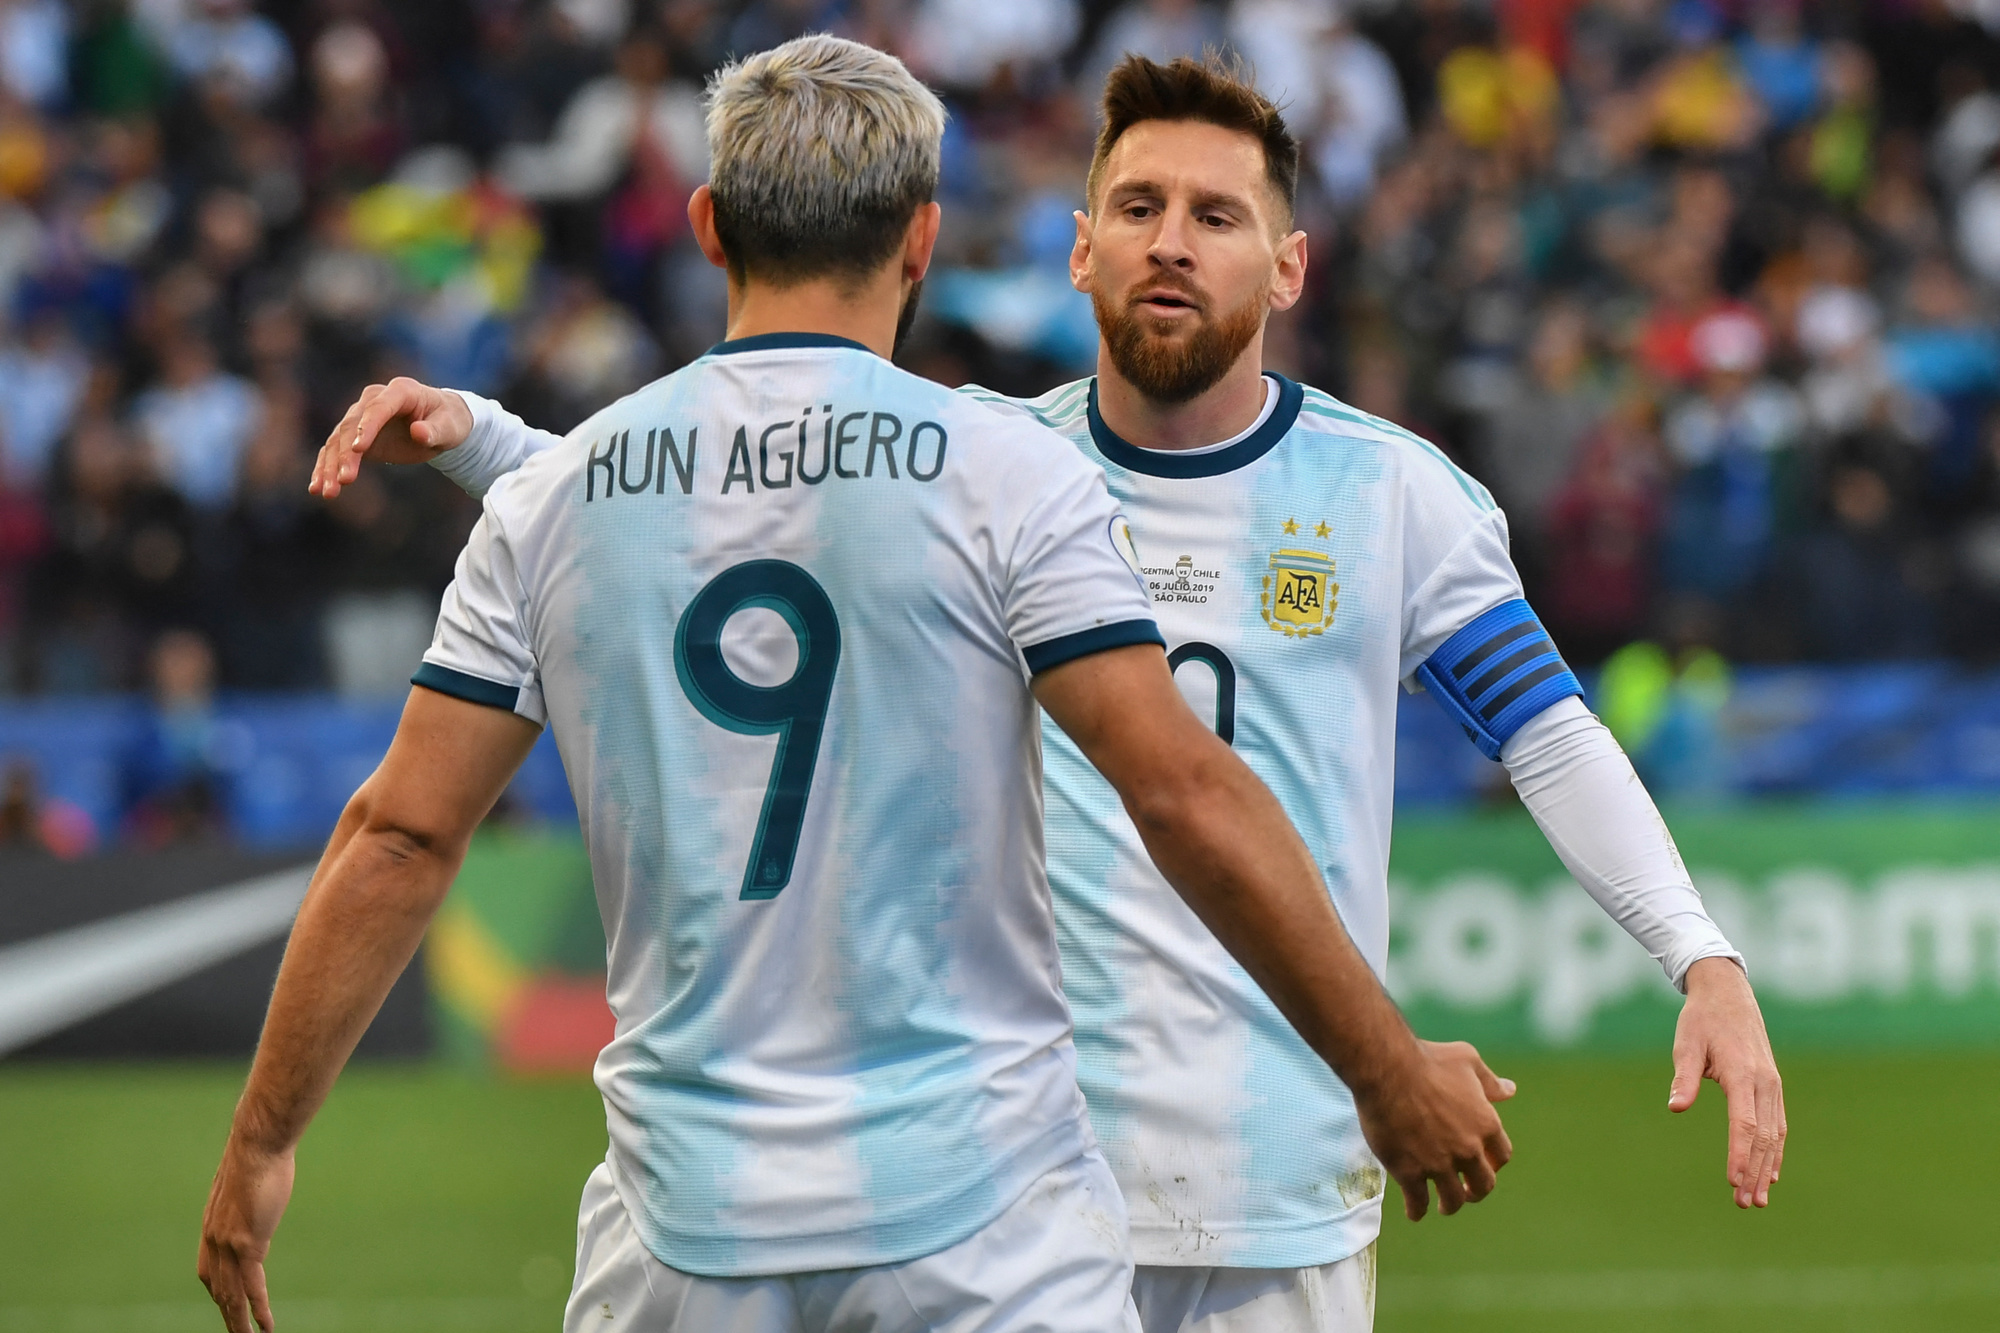 El Kun retrouvera-t-il son pote Messi au Barça ?, BELGA/AFP